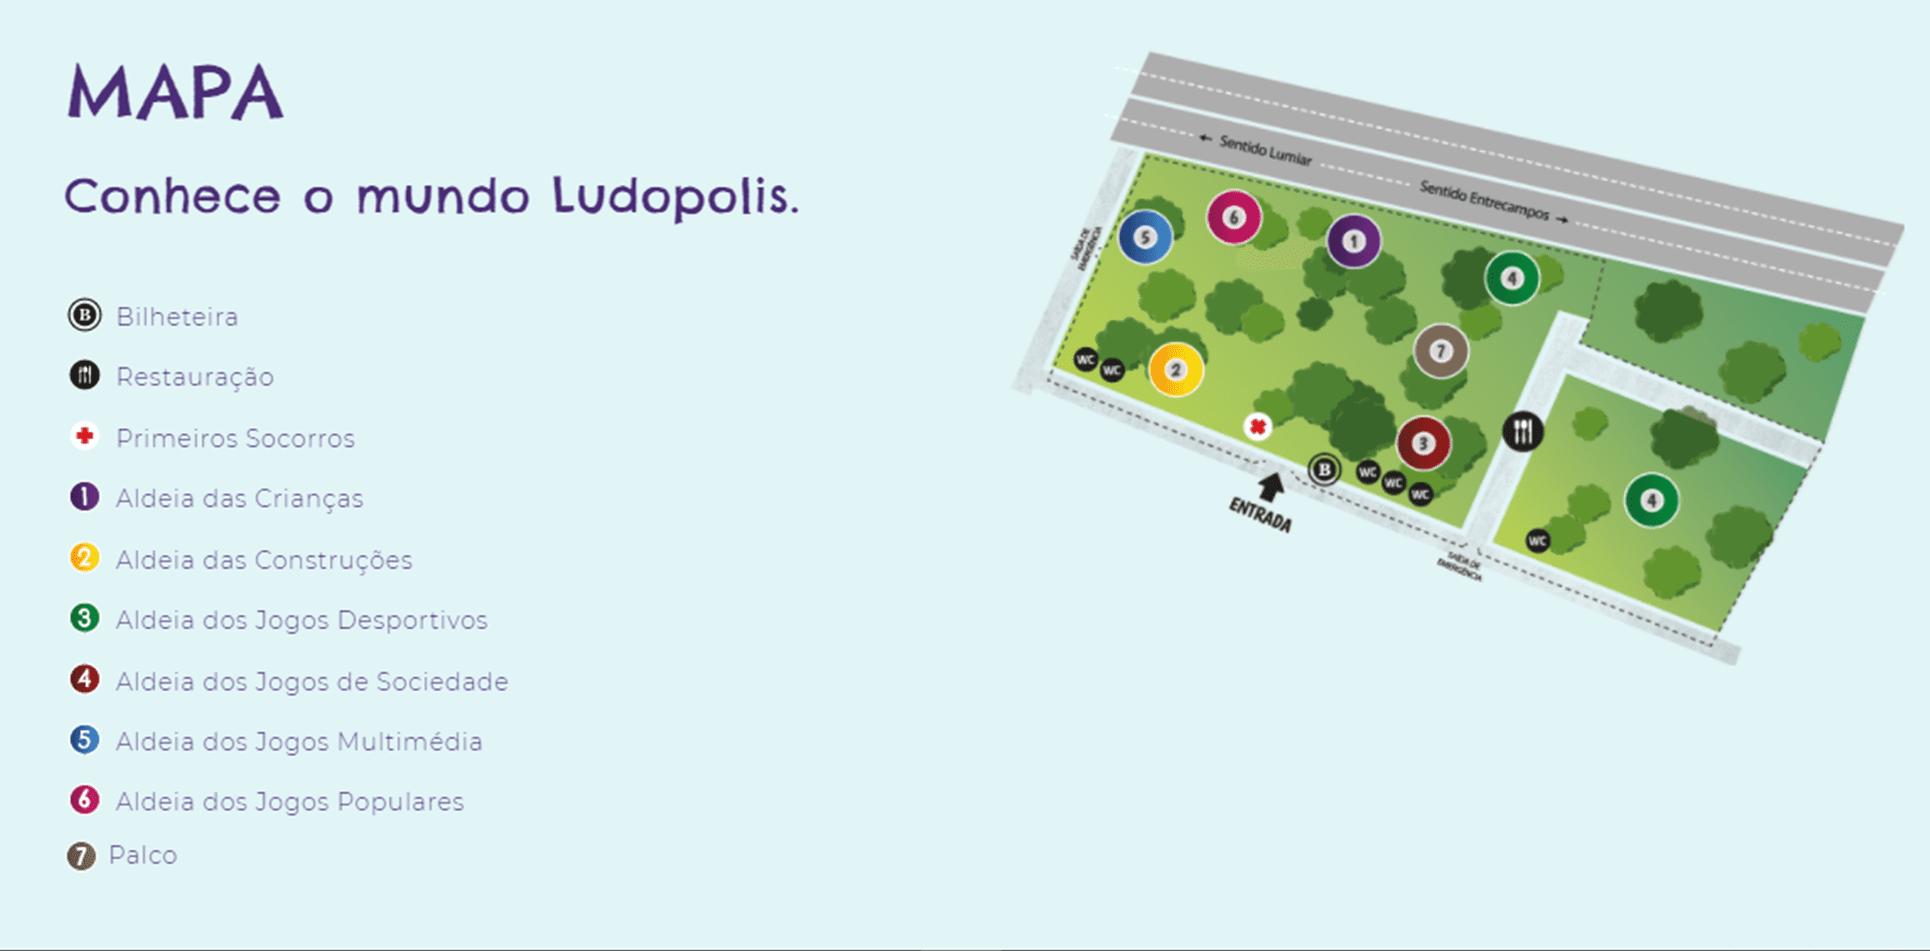 Ludopolis 2018 Mapa